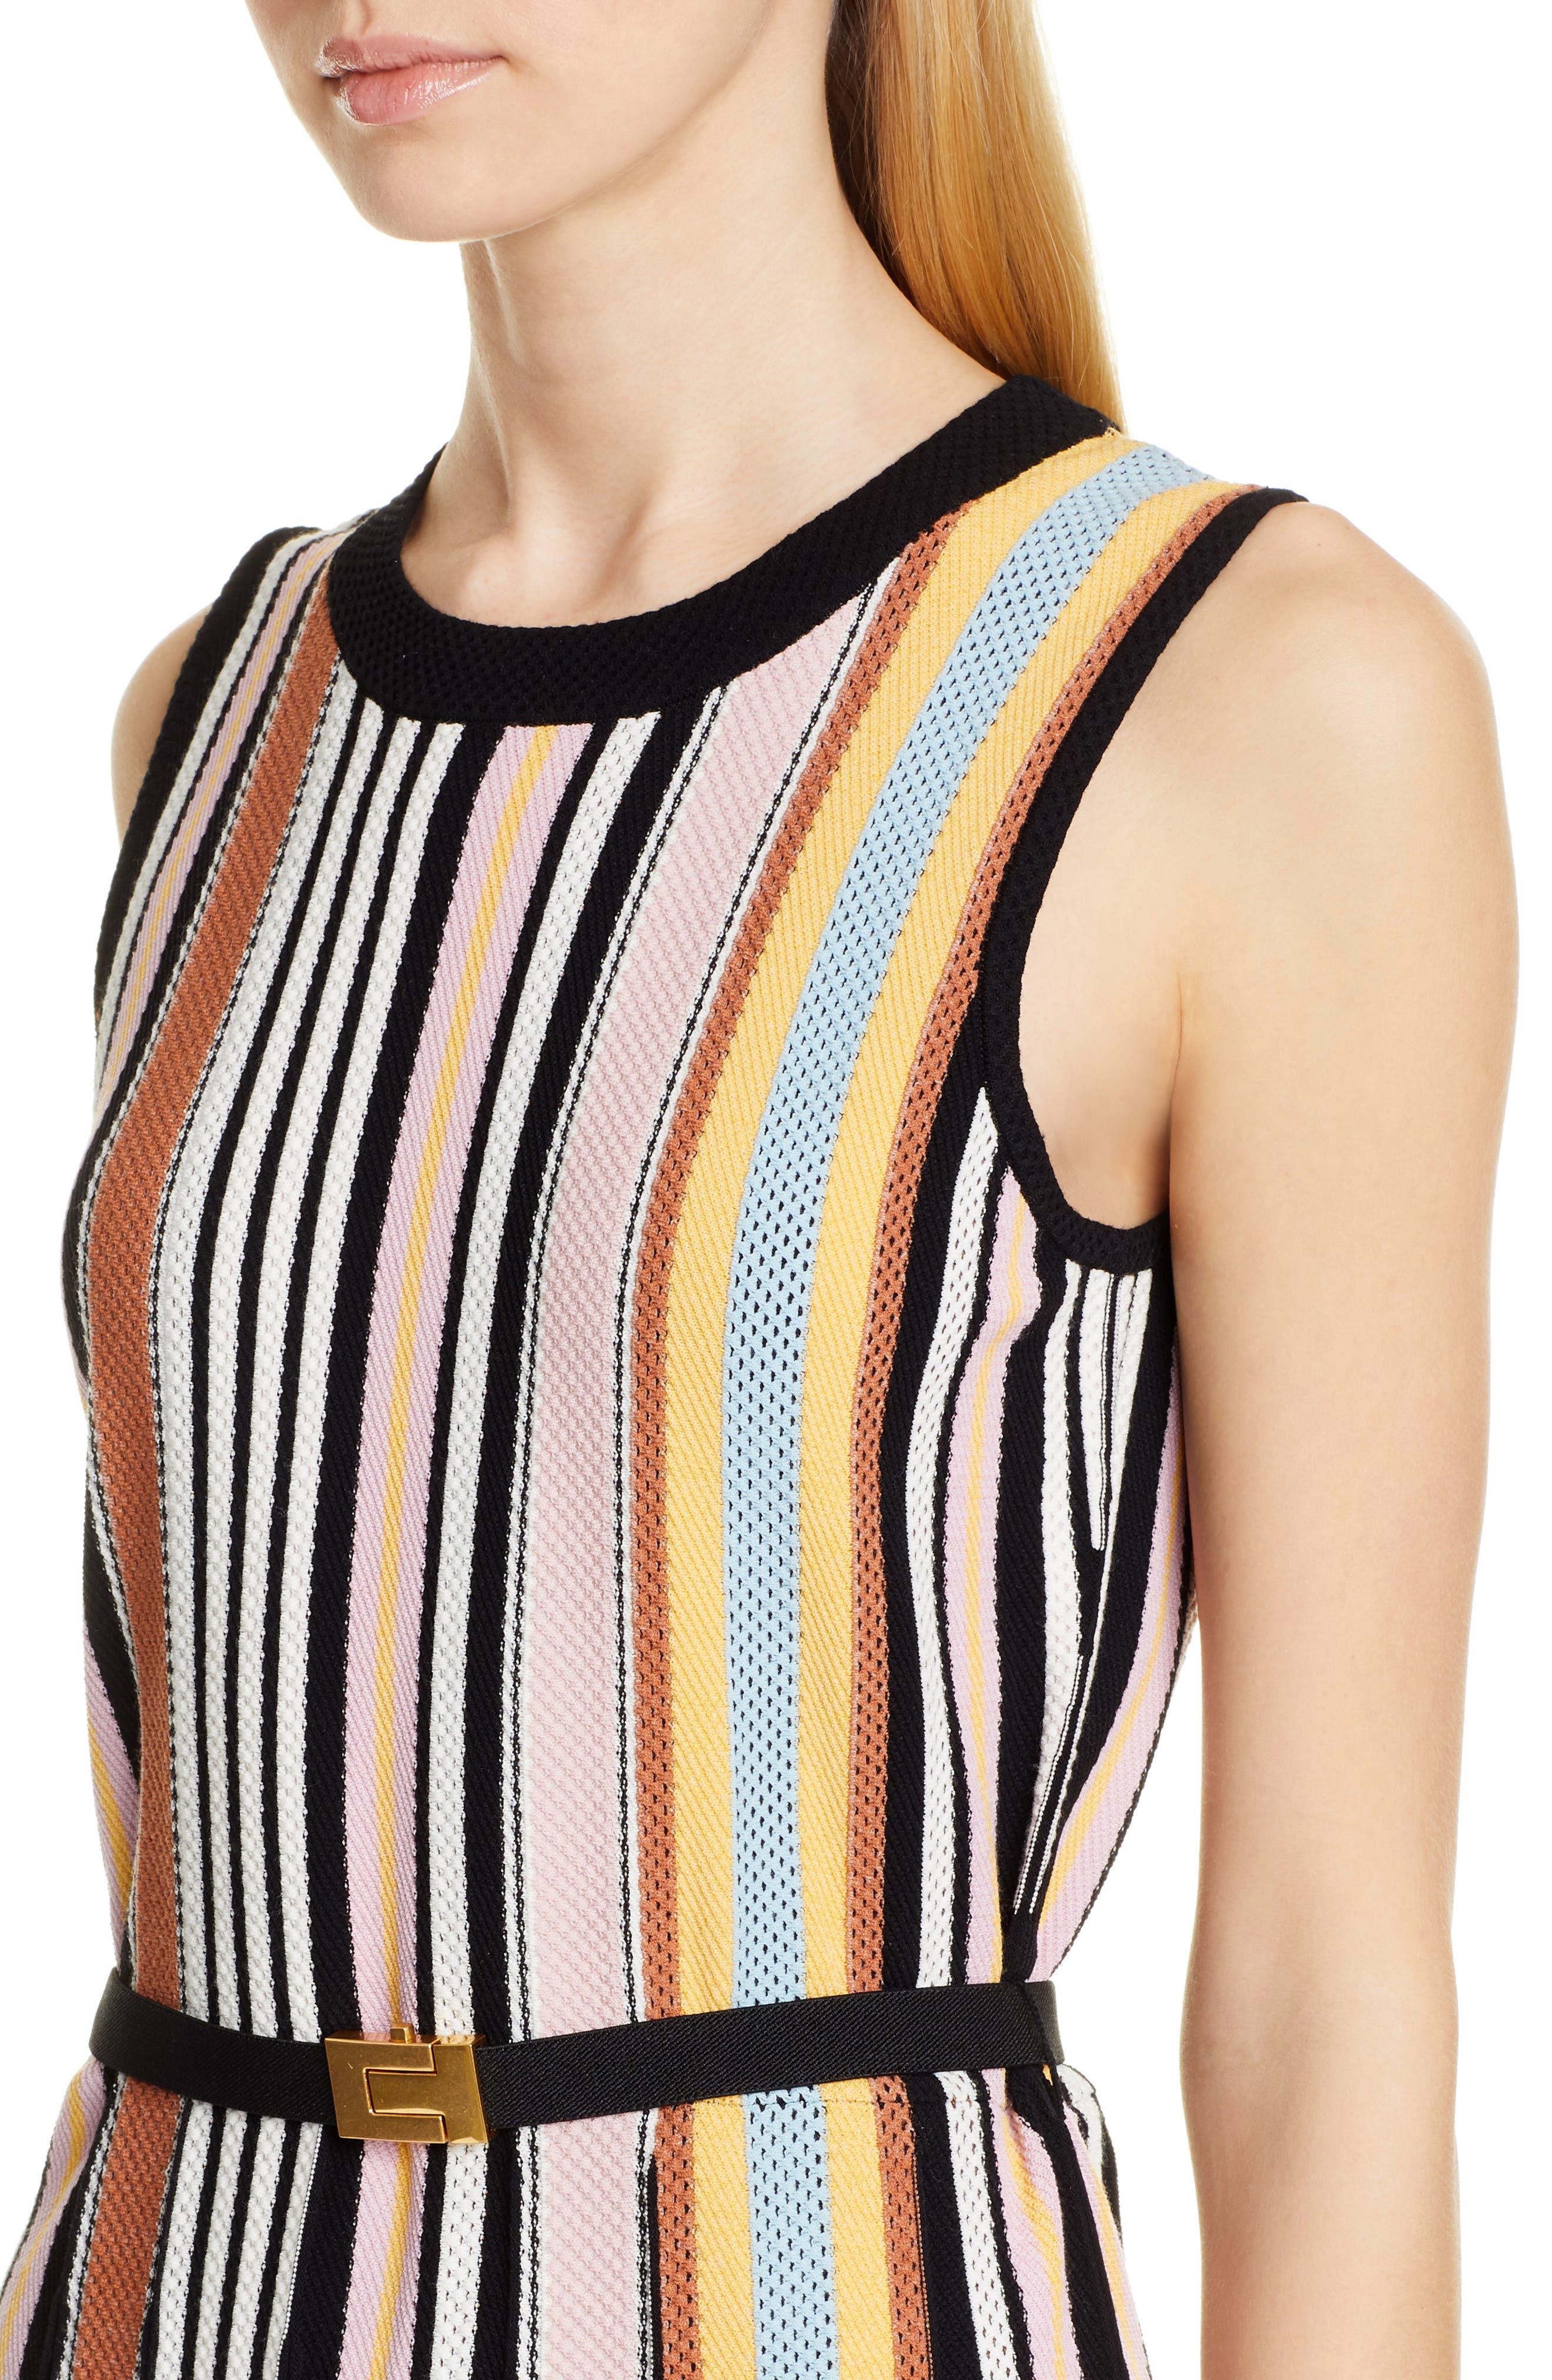 TORY BURCH, Stripe Sweater Dress, Alternate thumbnail 4, color, WEBBING STRIPE